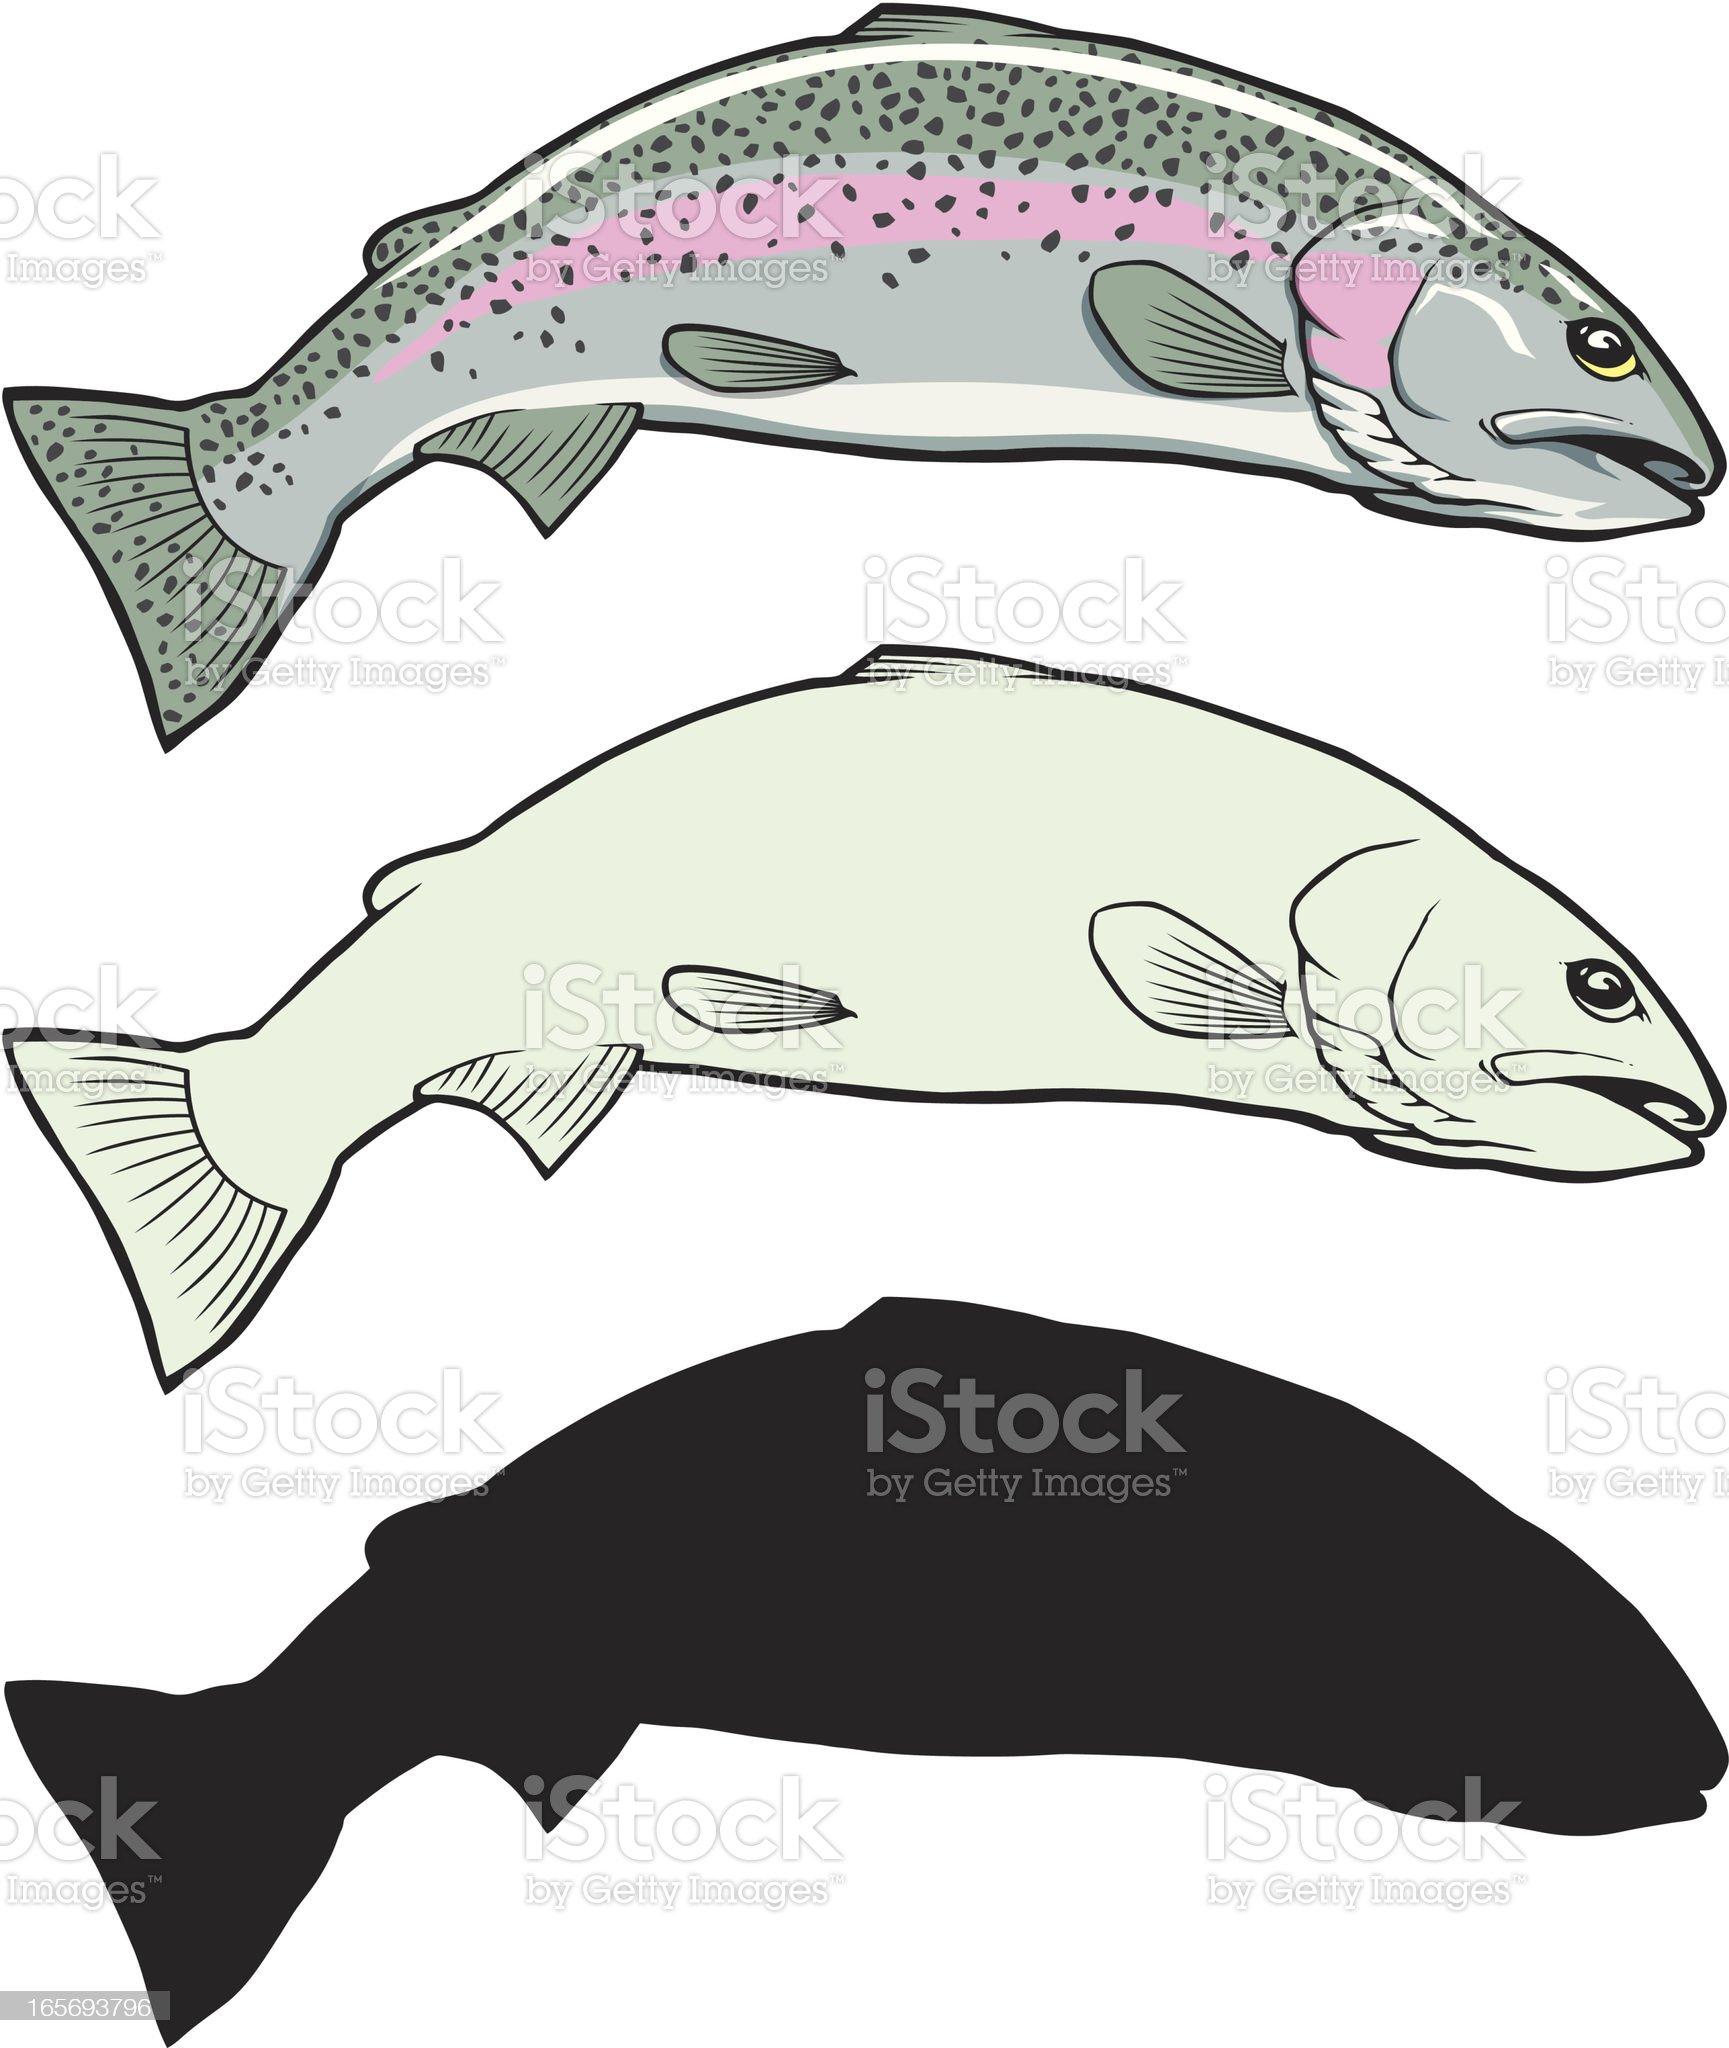 Rainbow Trout Illustration Set royalty-free stock vector art